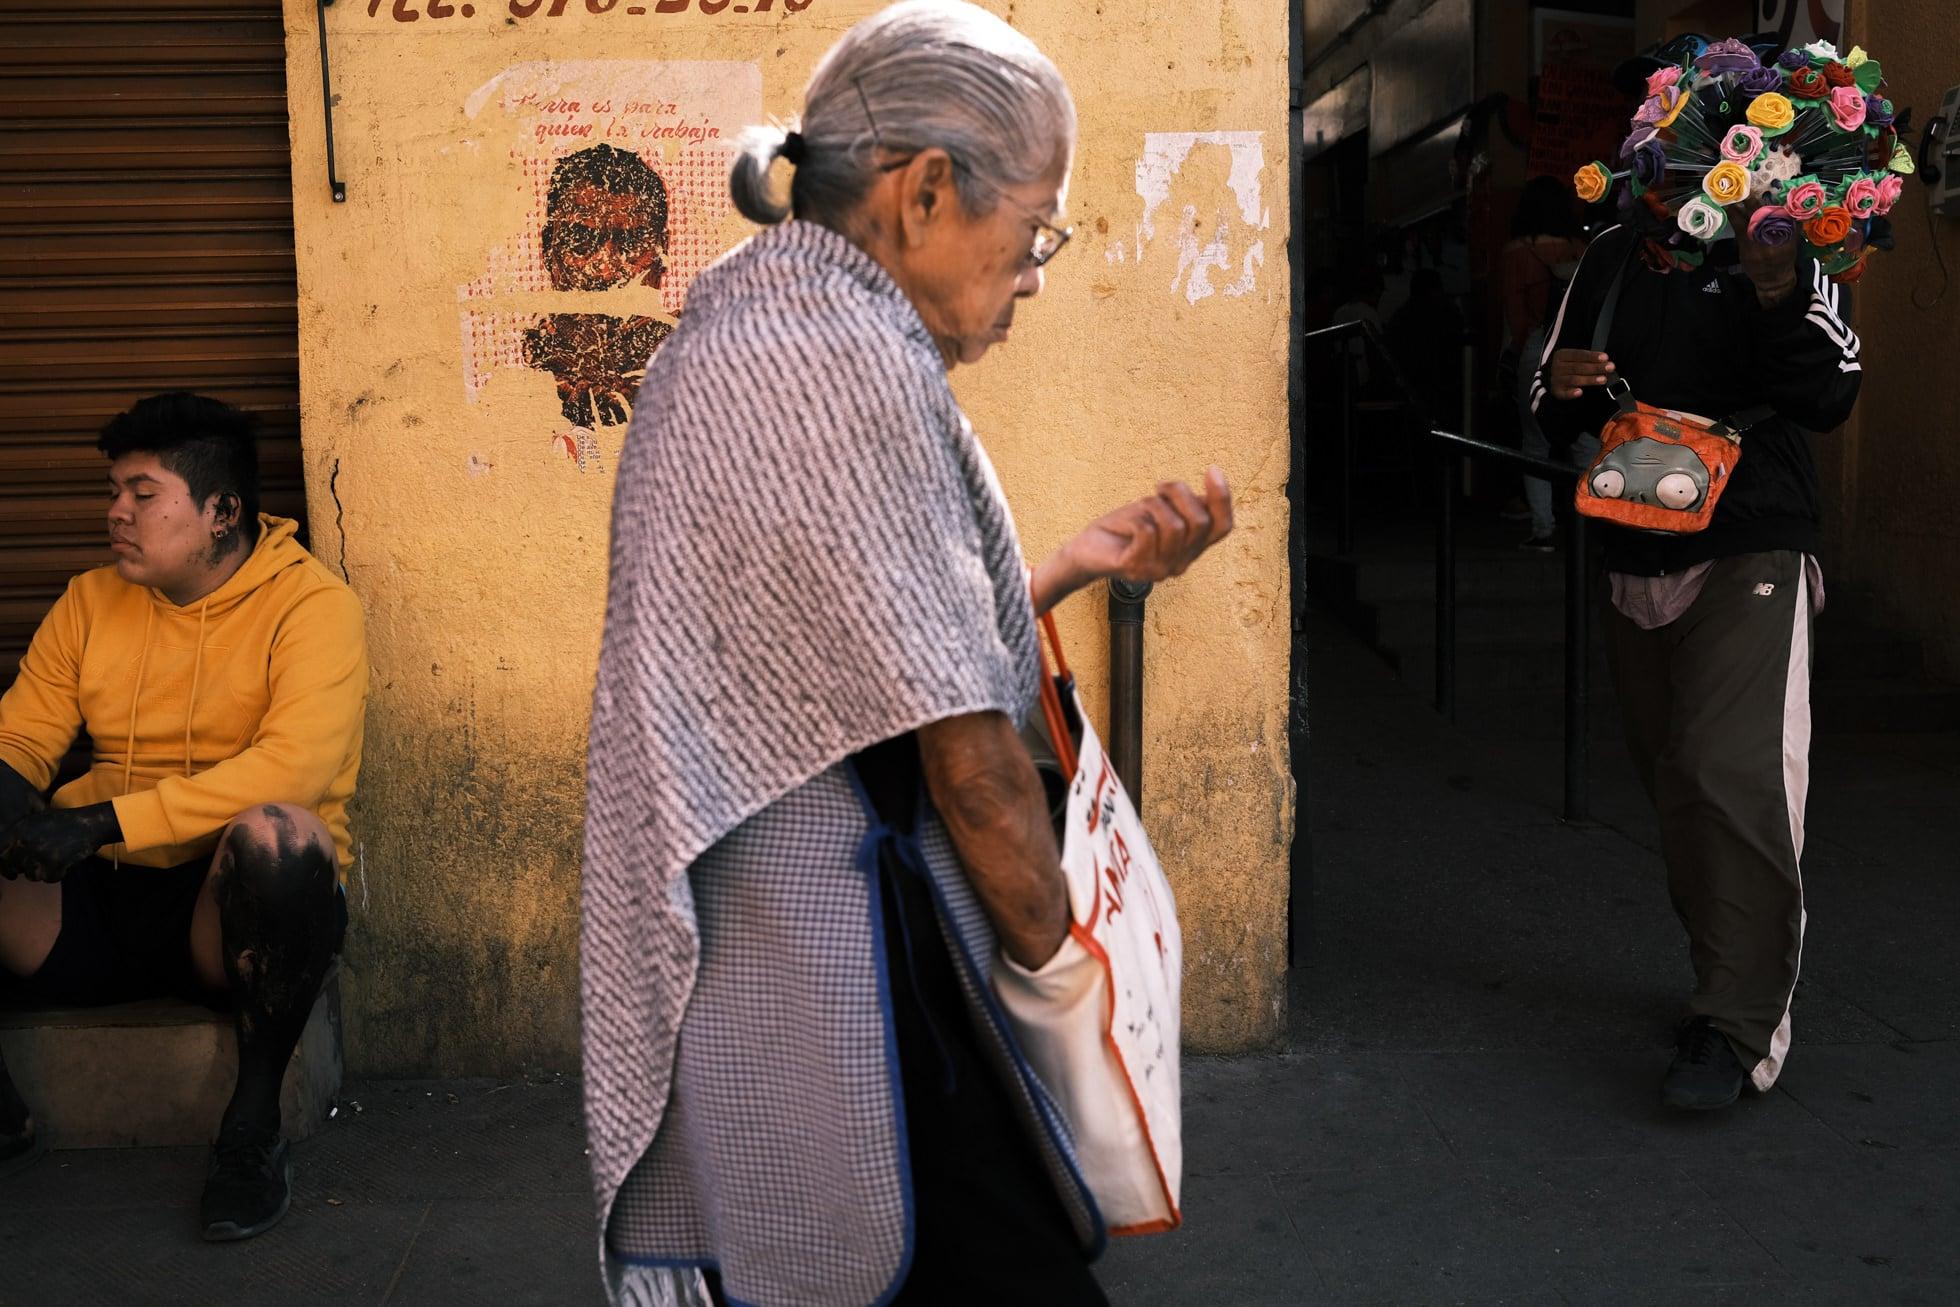 fujifilm-x-pro3-mexico-street-photography-67